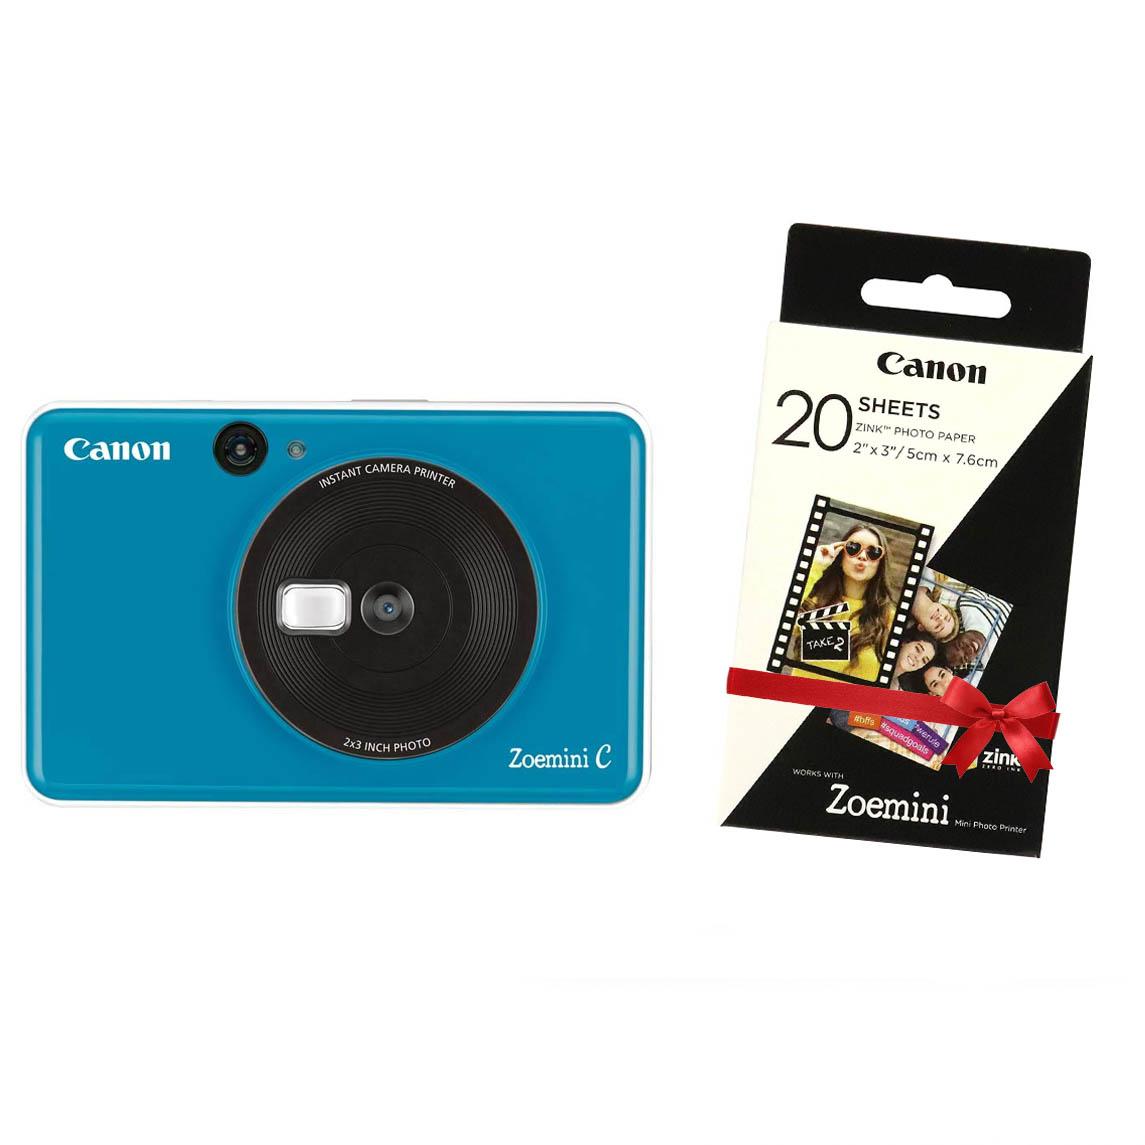 "Canon INSTANT CAM. PRINTER ZOEMINI ""C"" Seaside Blue"